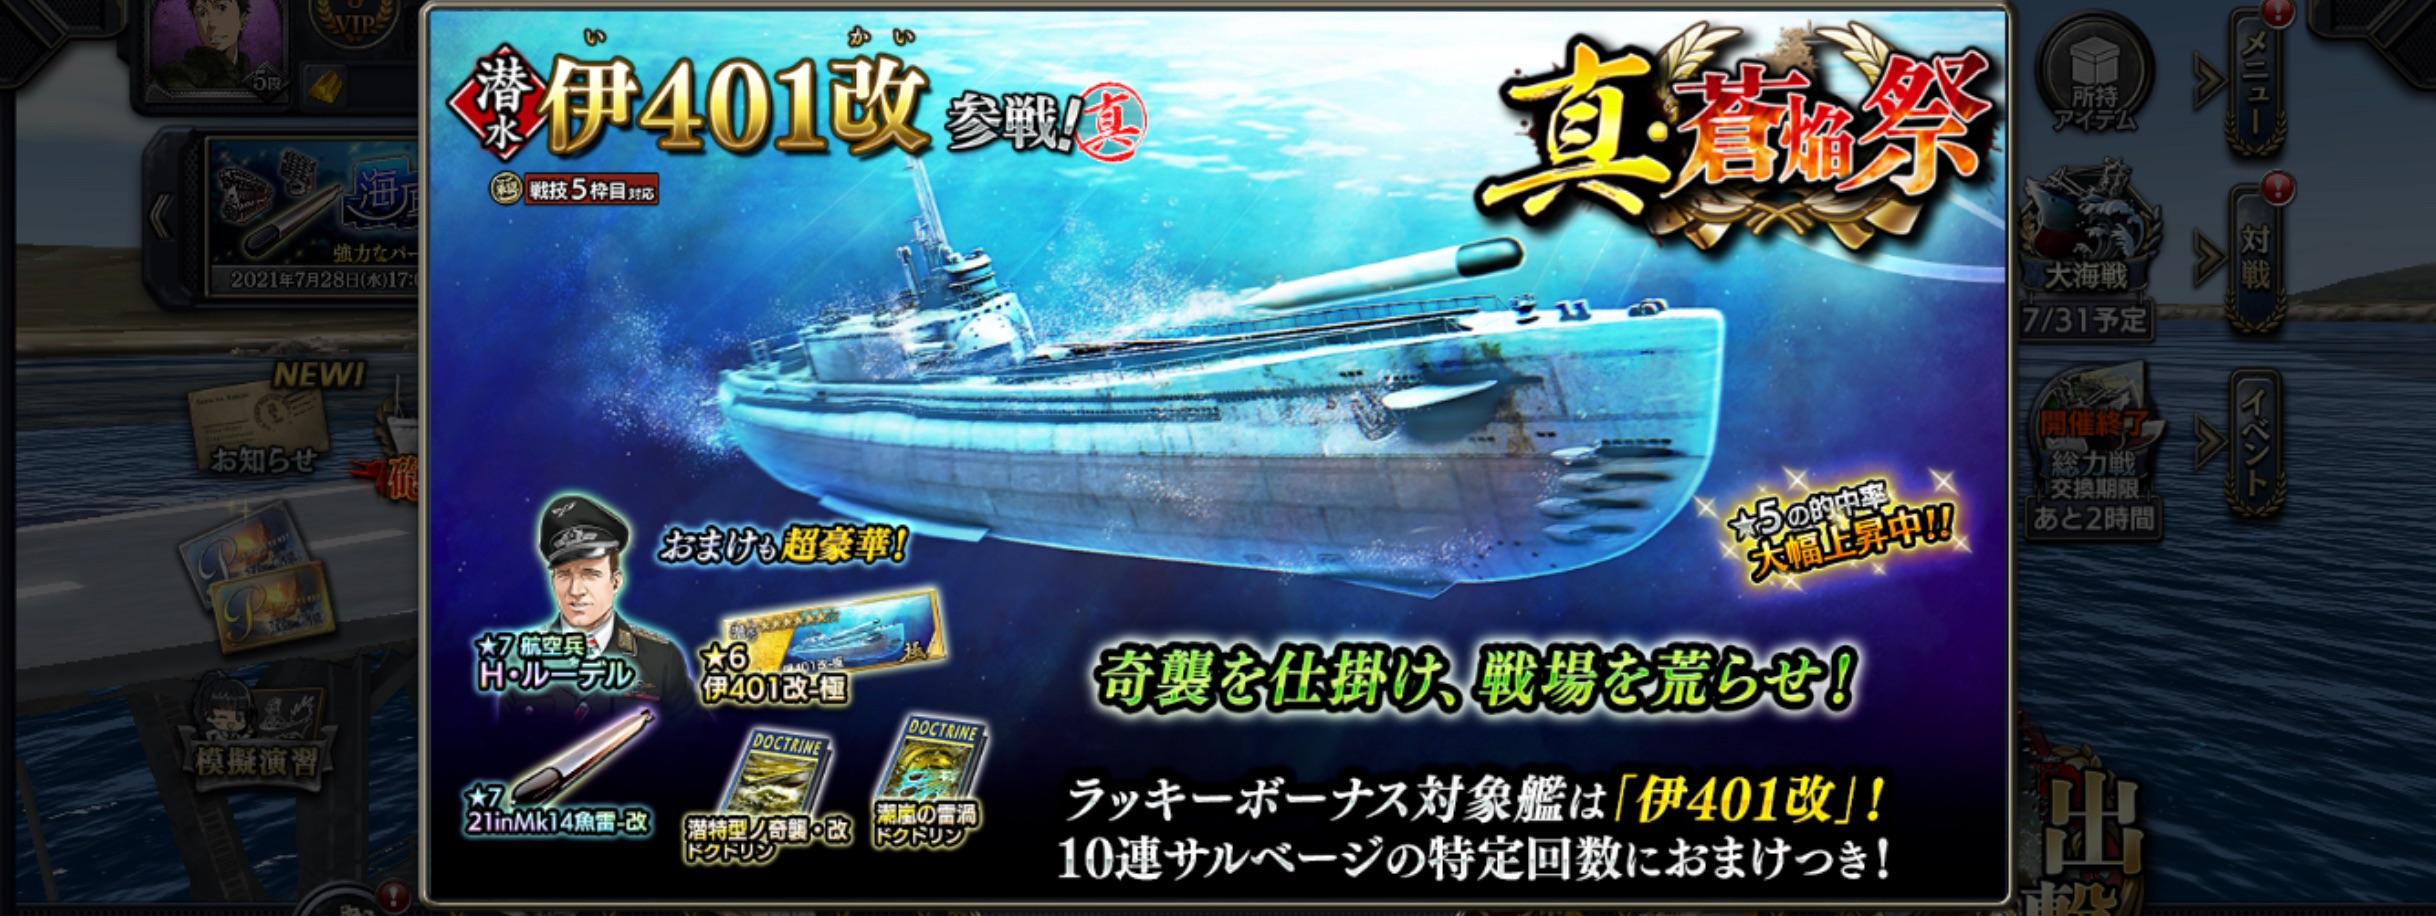 submarine-i401K